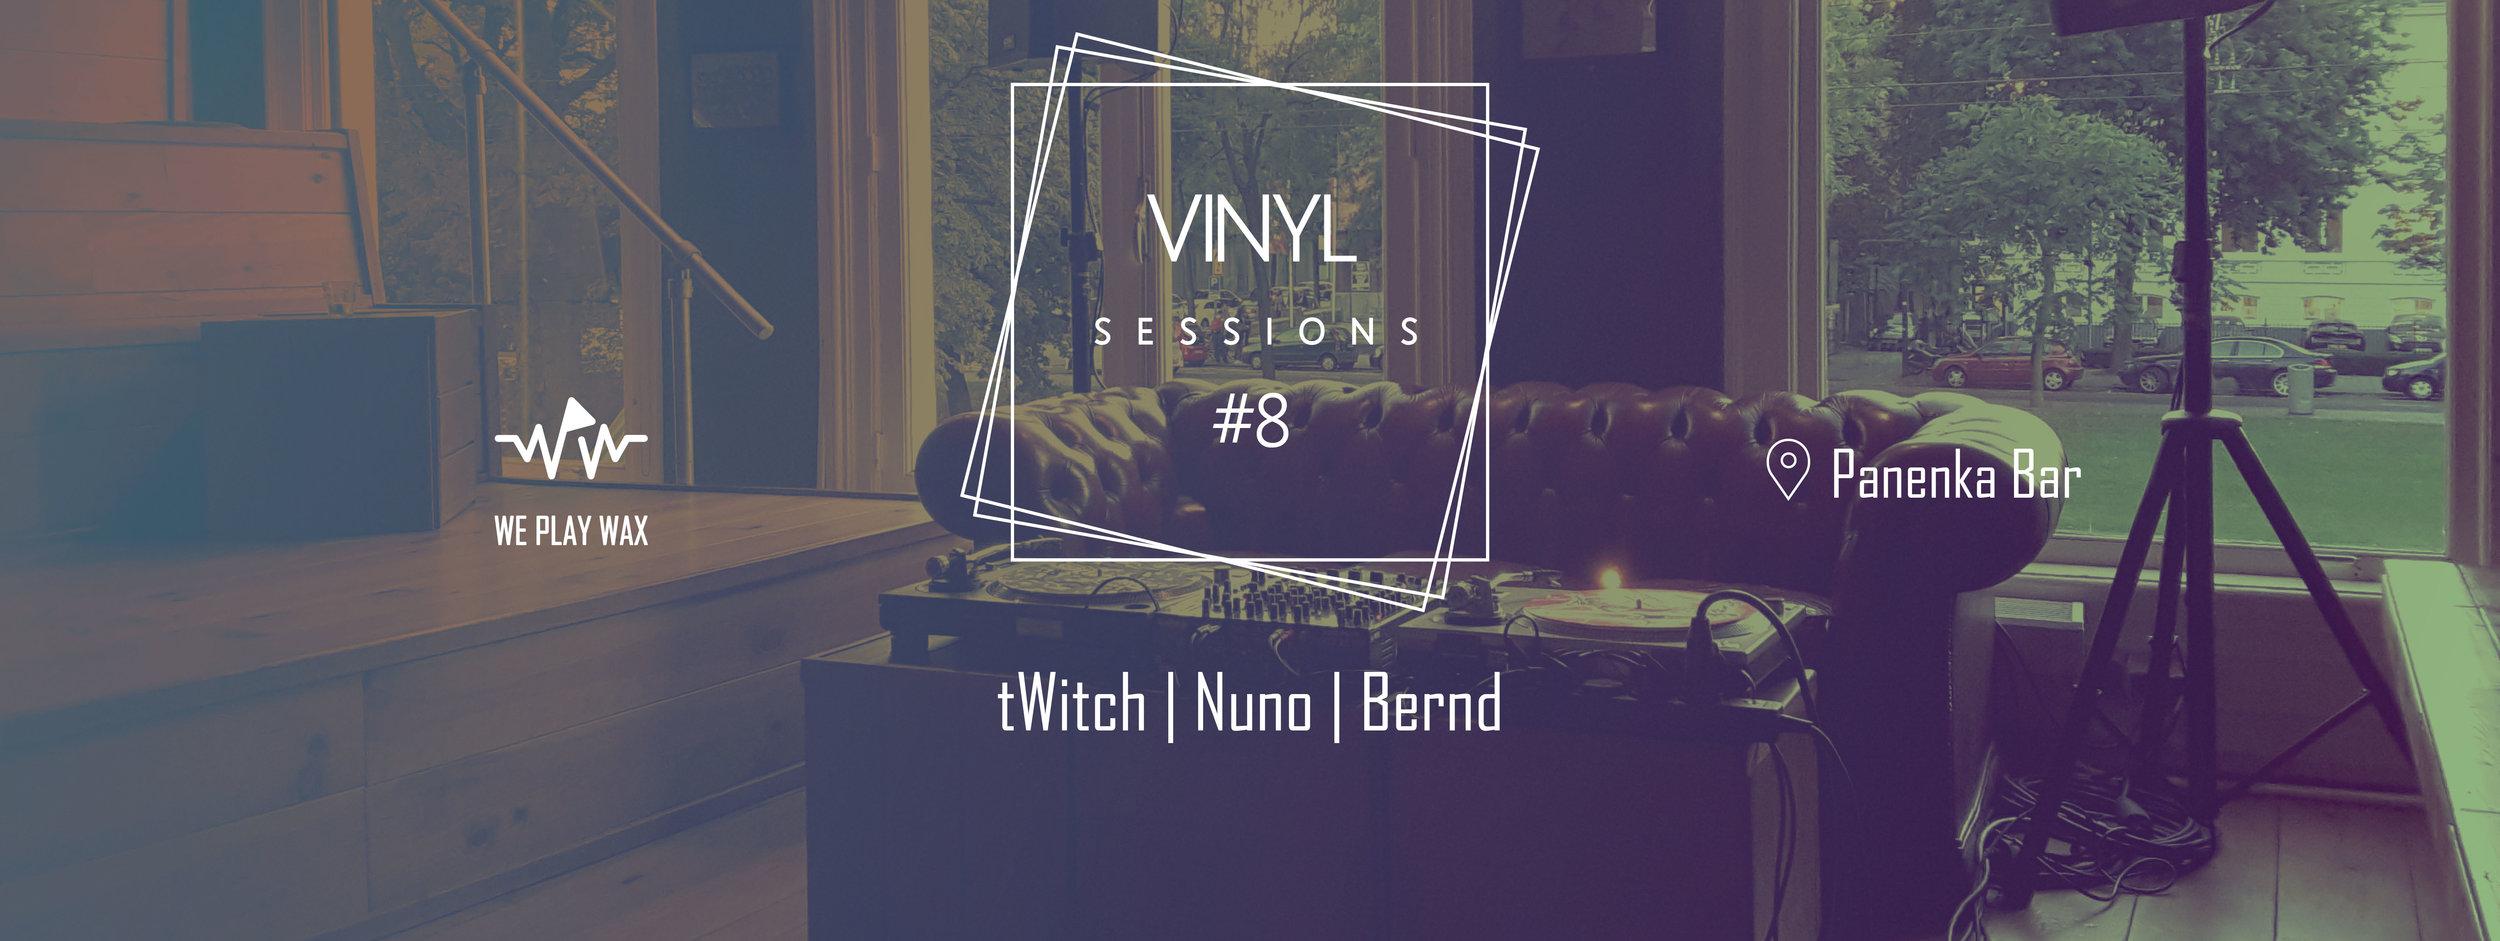 Vinyl Sessions #08 - tWitch, Nuno, Bernd